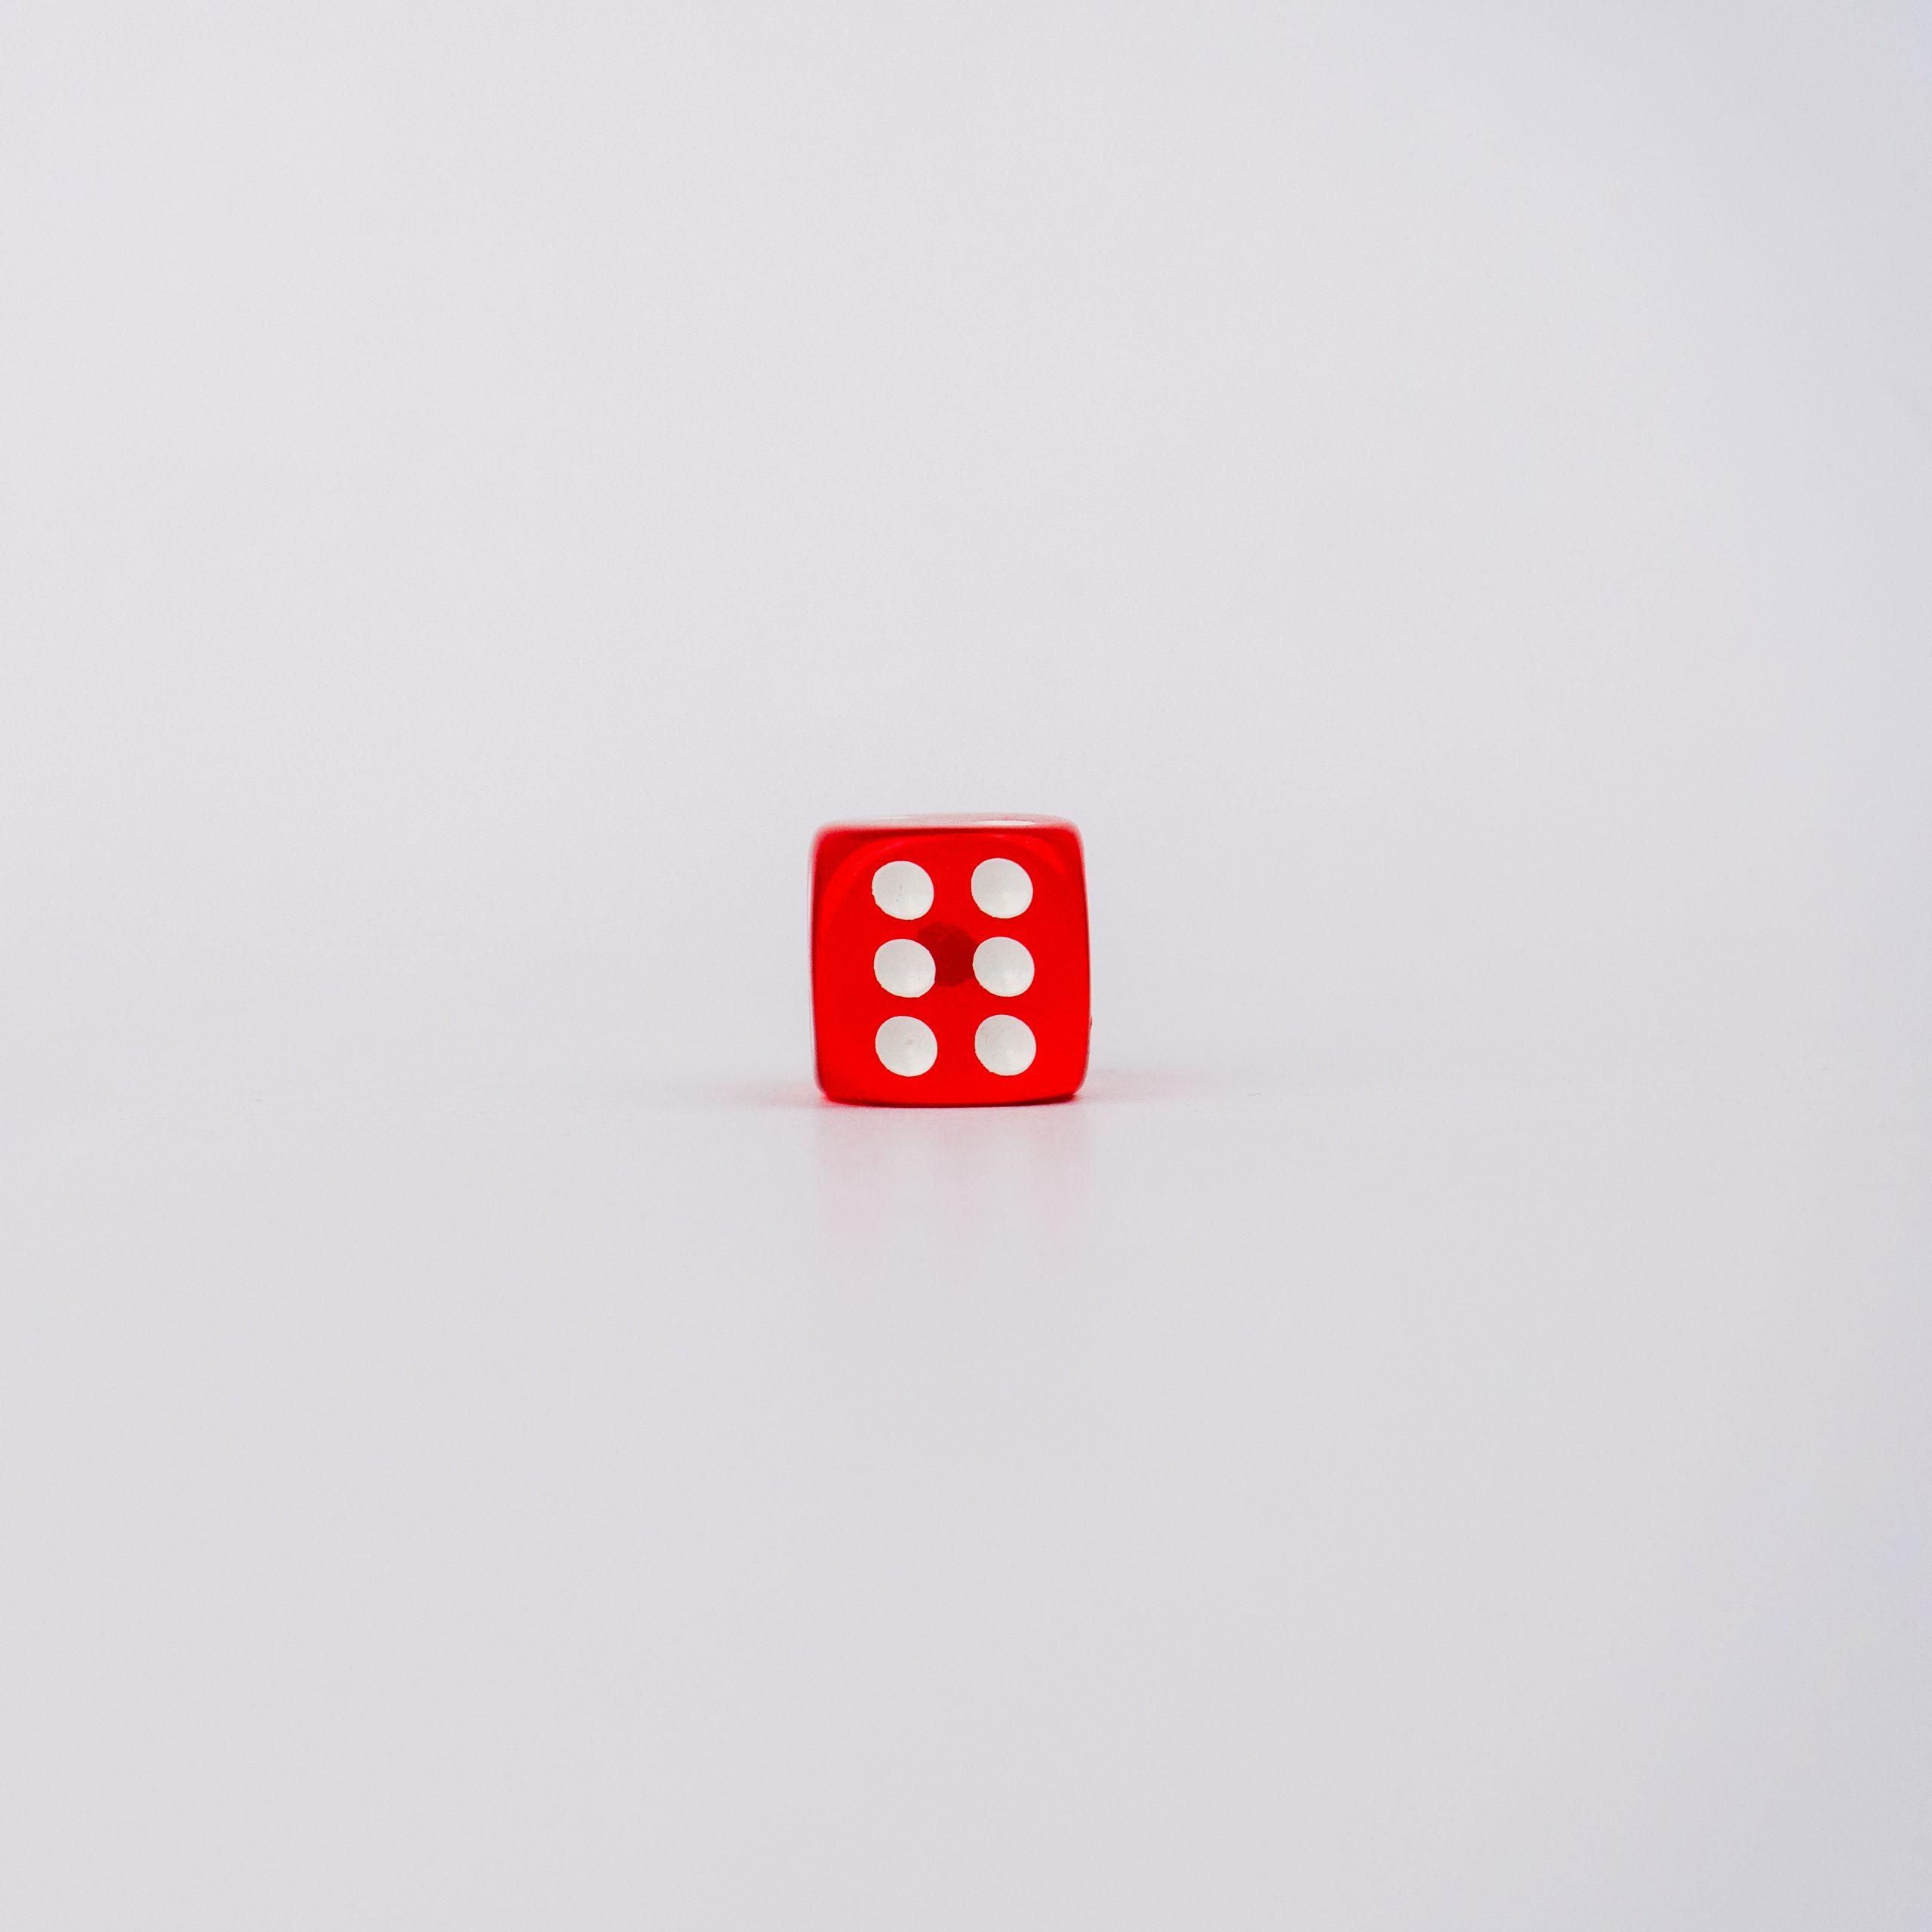 Six on dice